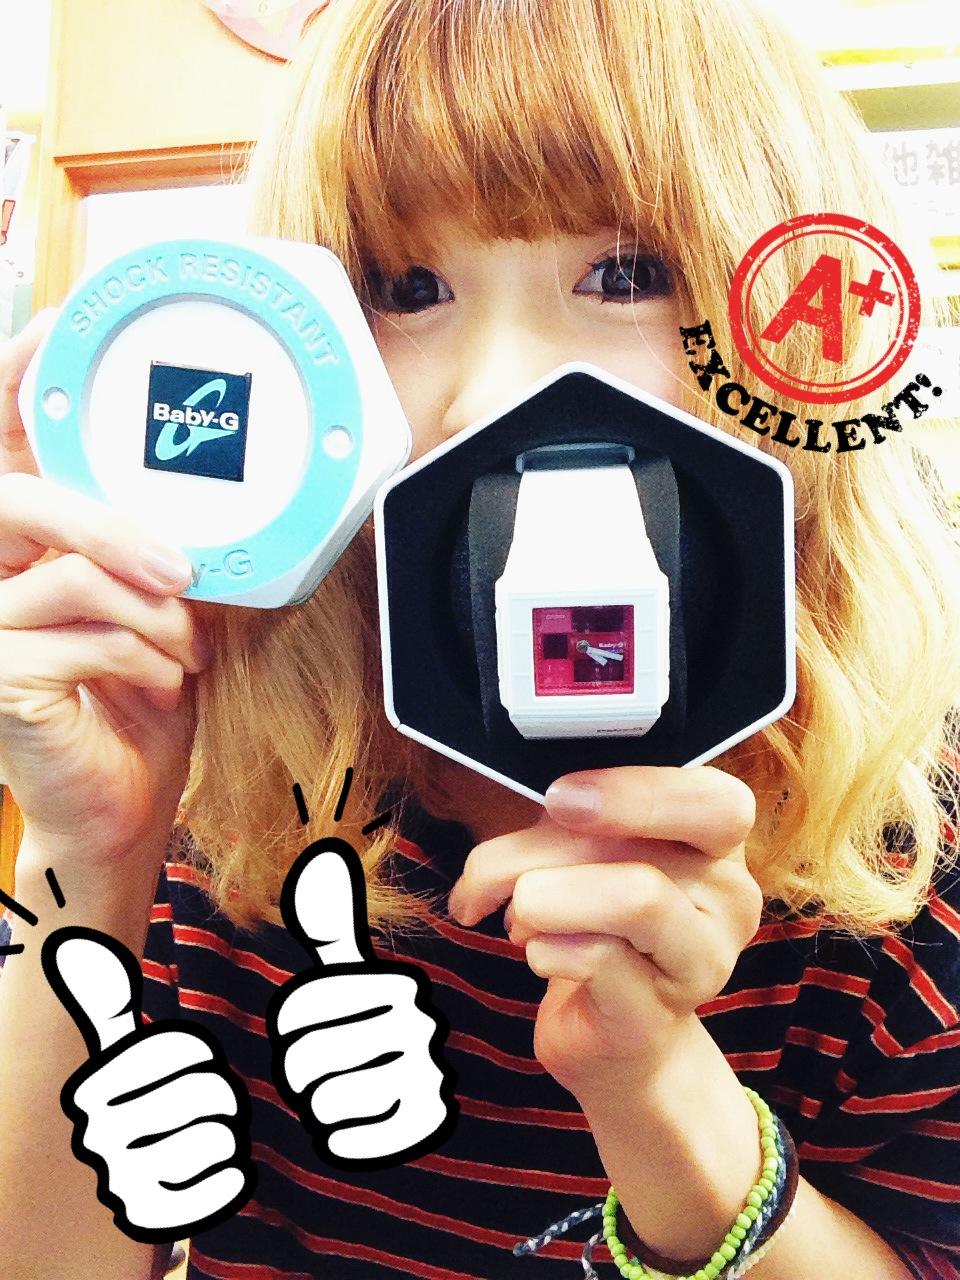 【baby-G】腕時計、レディース、ホワイト★新作入荷☆小平☆東大和☆府中高価買取☆